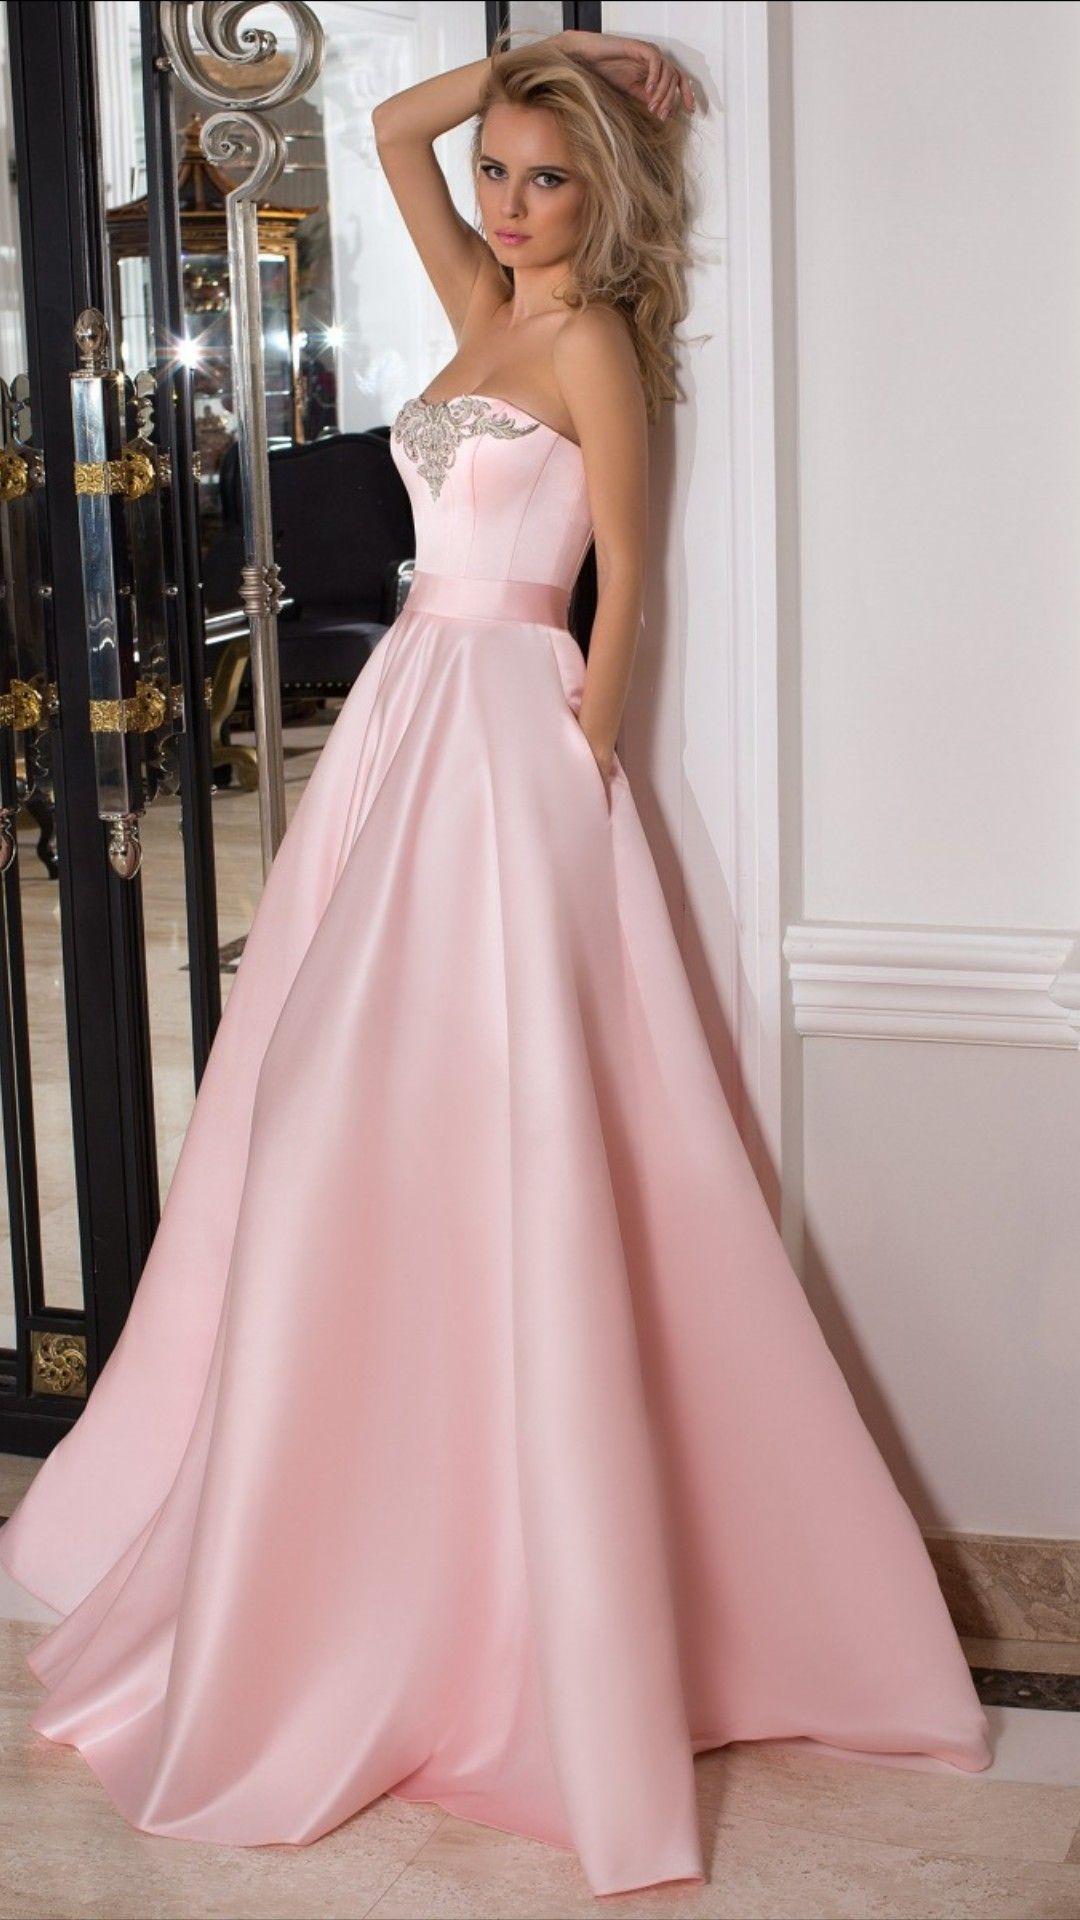 Pin de 🌟Cori🌟 en Dress Up   Pinterest   Beautiful, Cabello y Boda